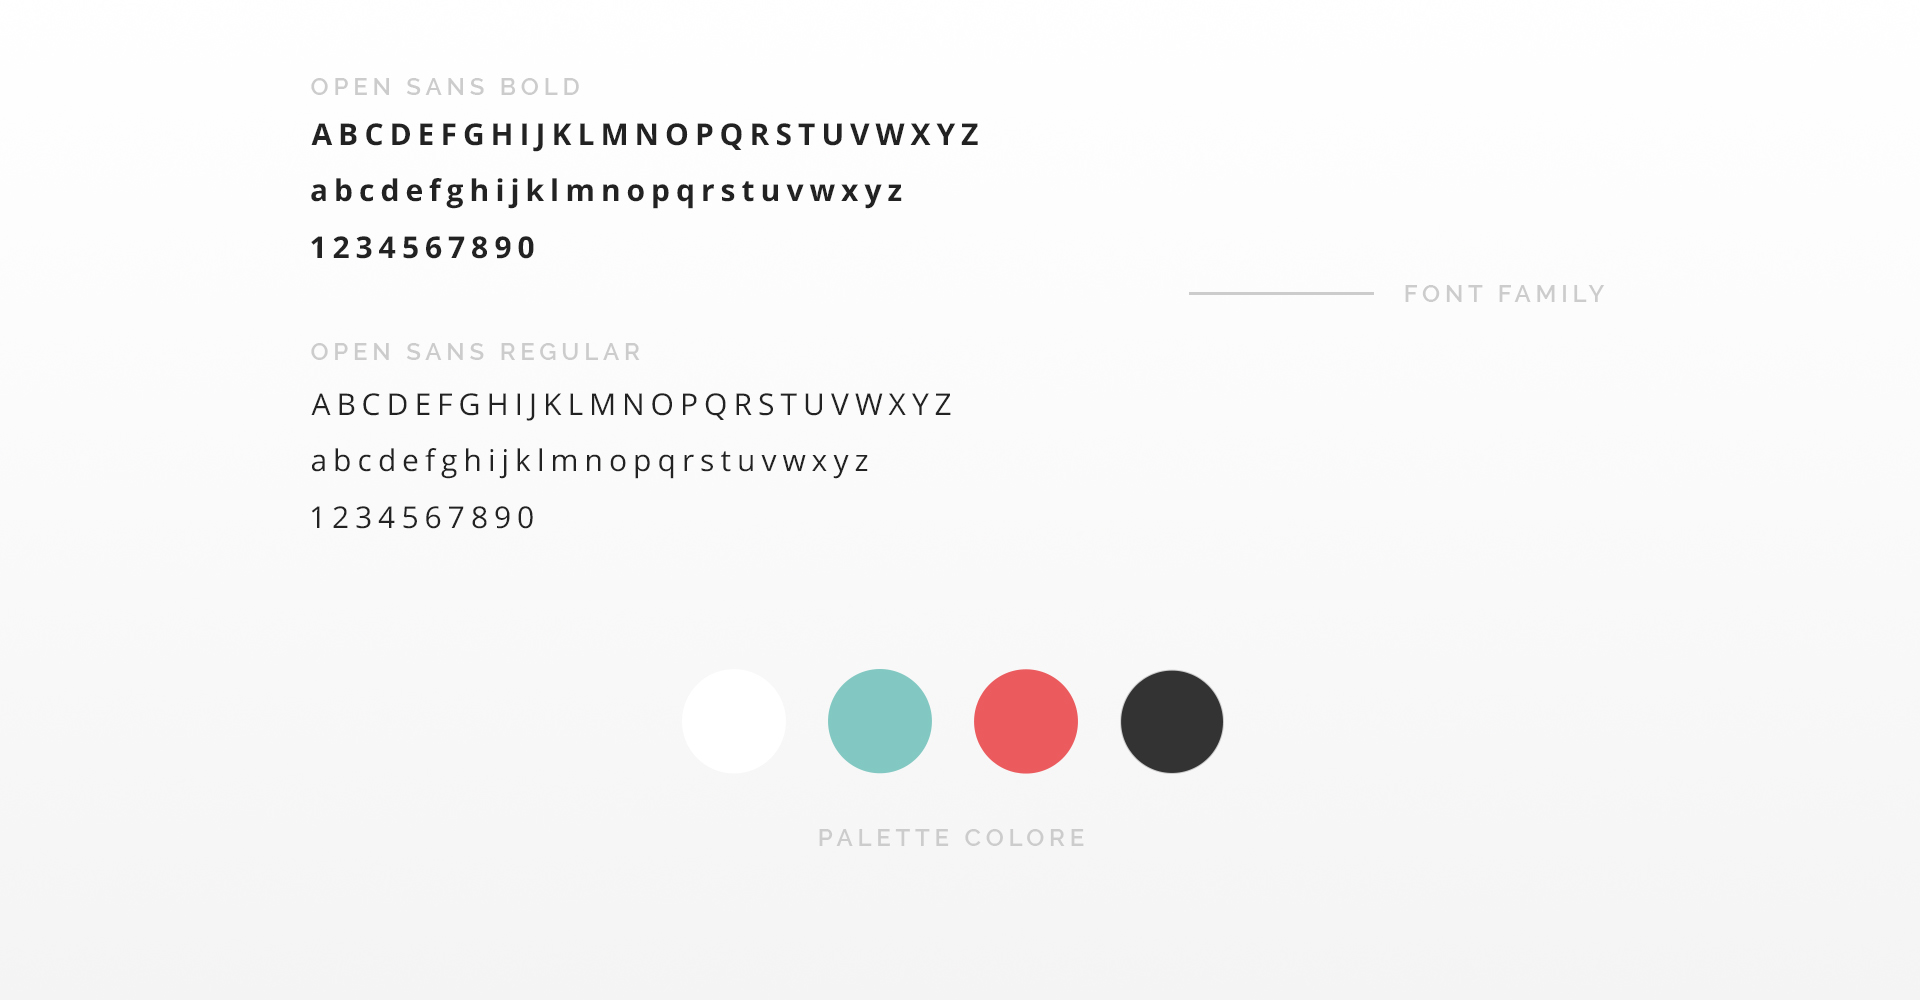 buru buru e-commerce palette and style